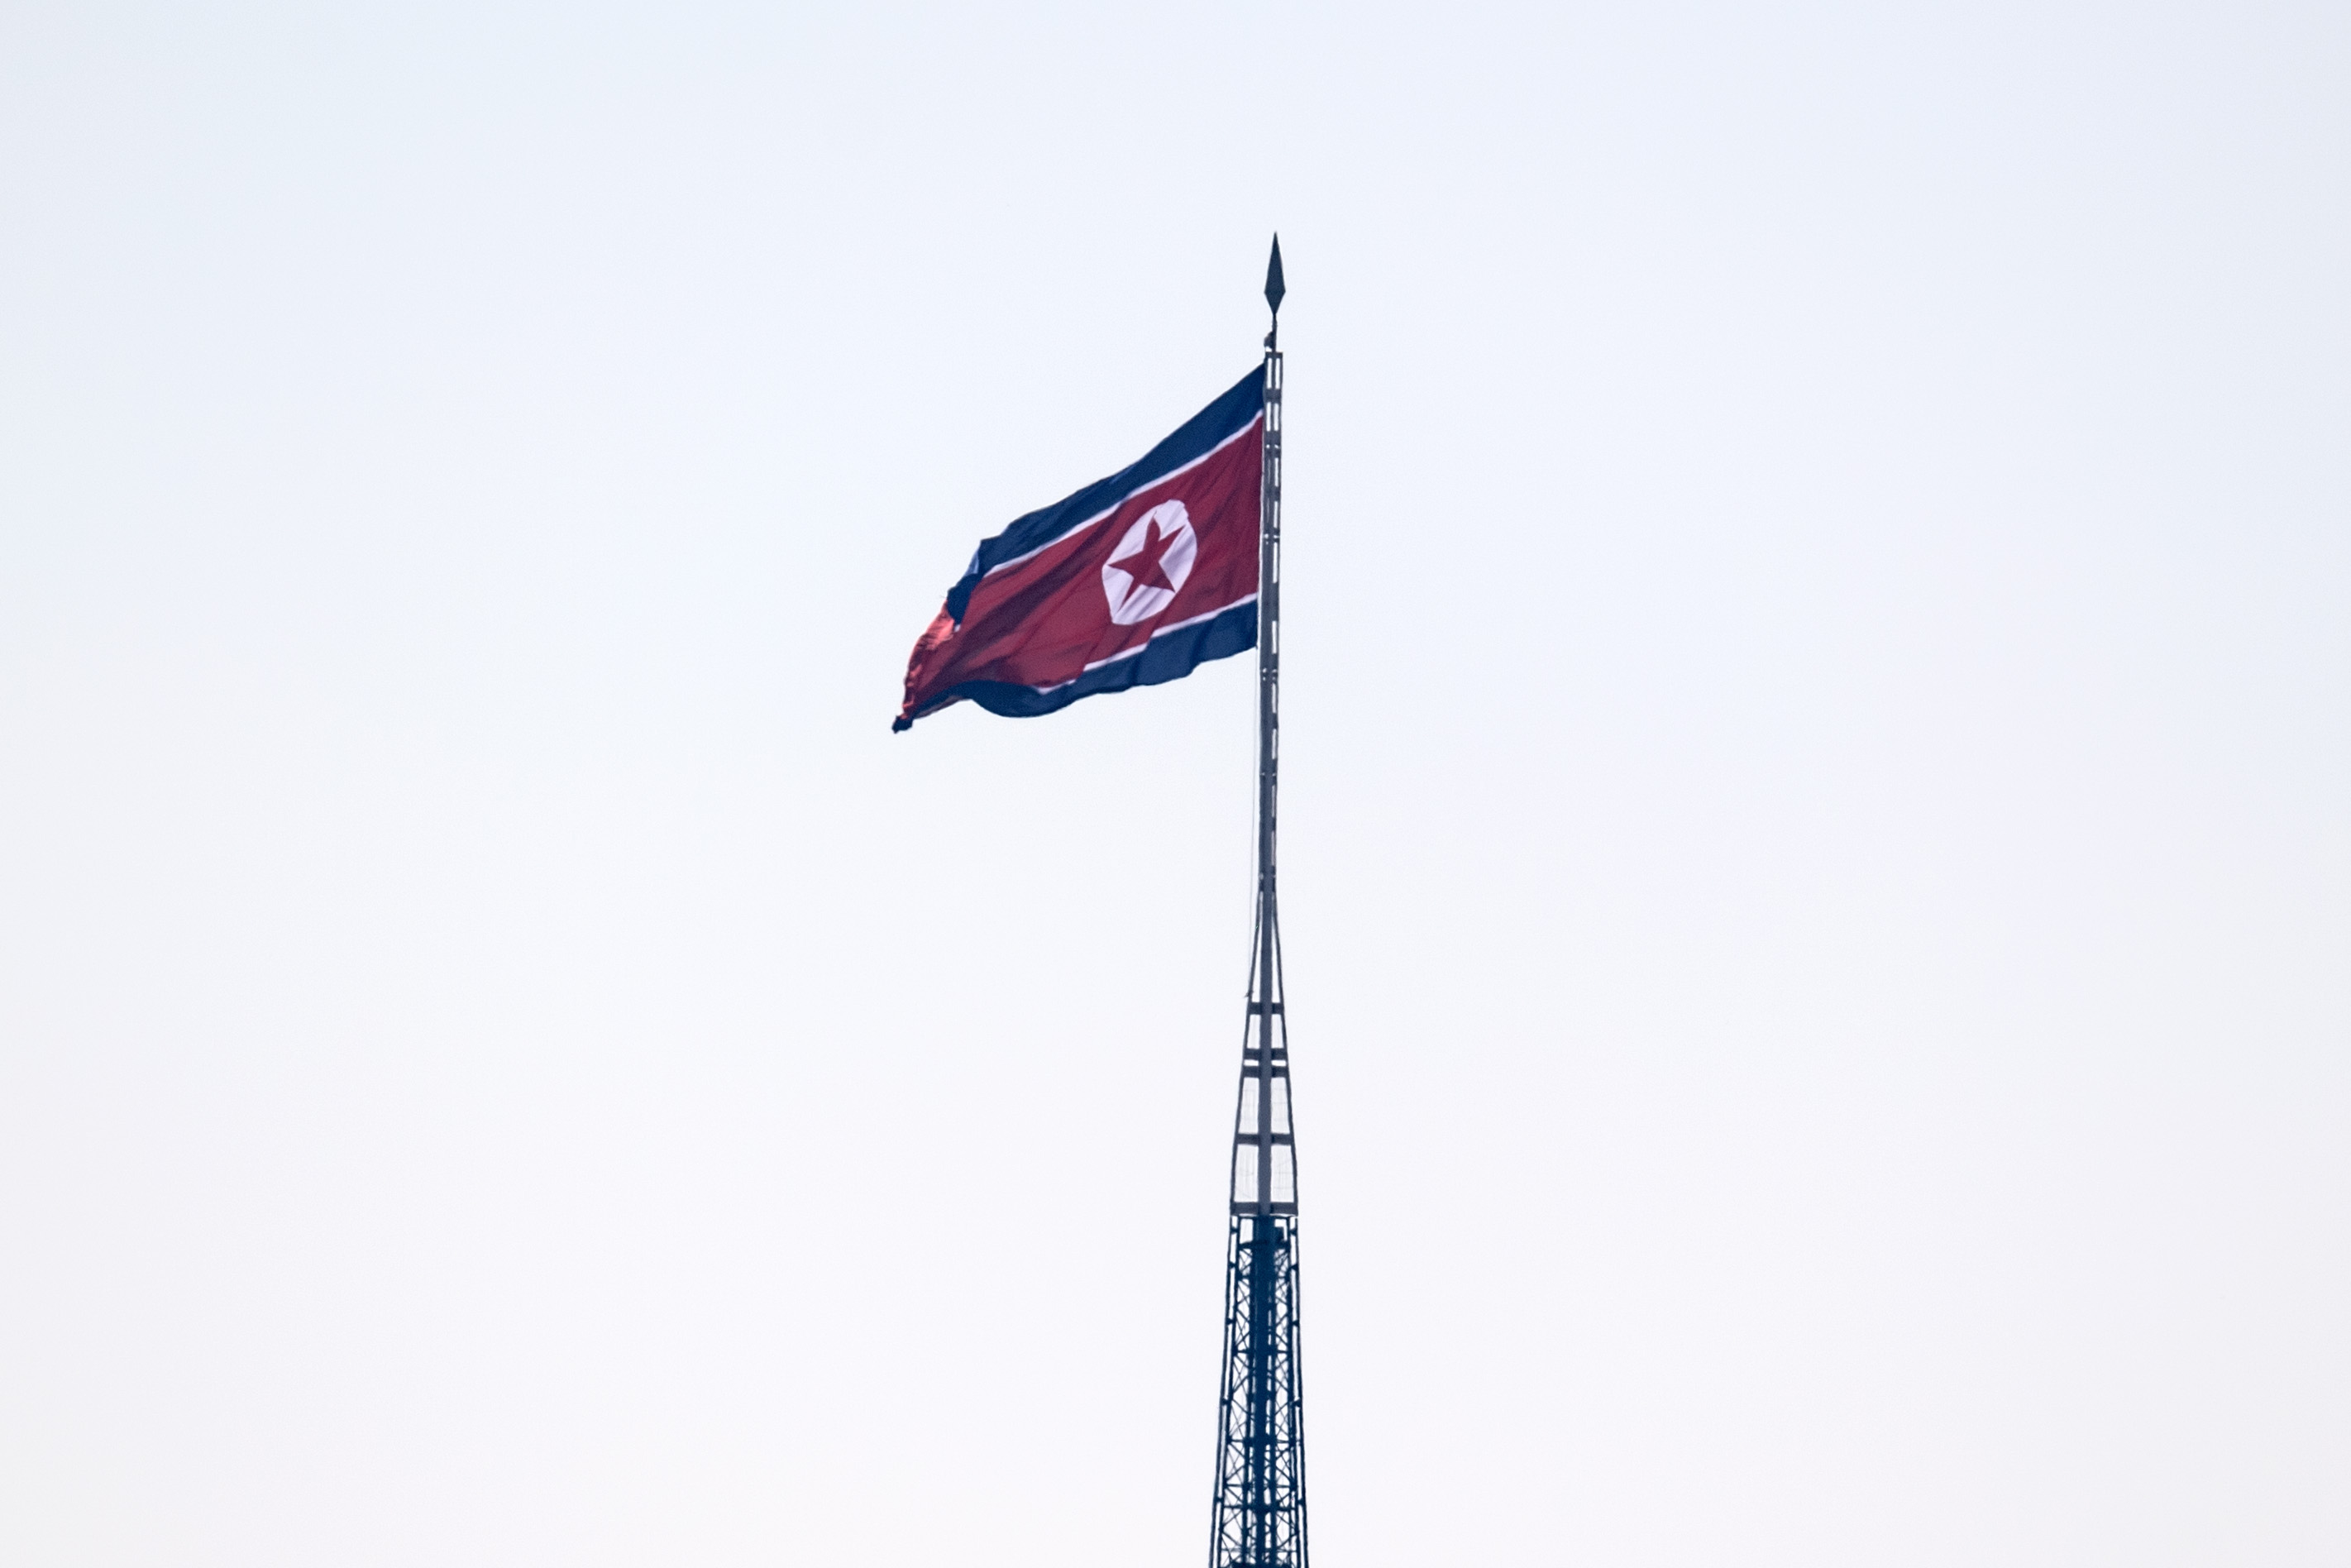 Awkward: the upheld travel ban still applies to North Korea, too